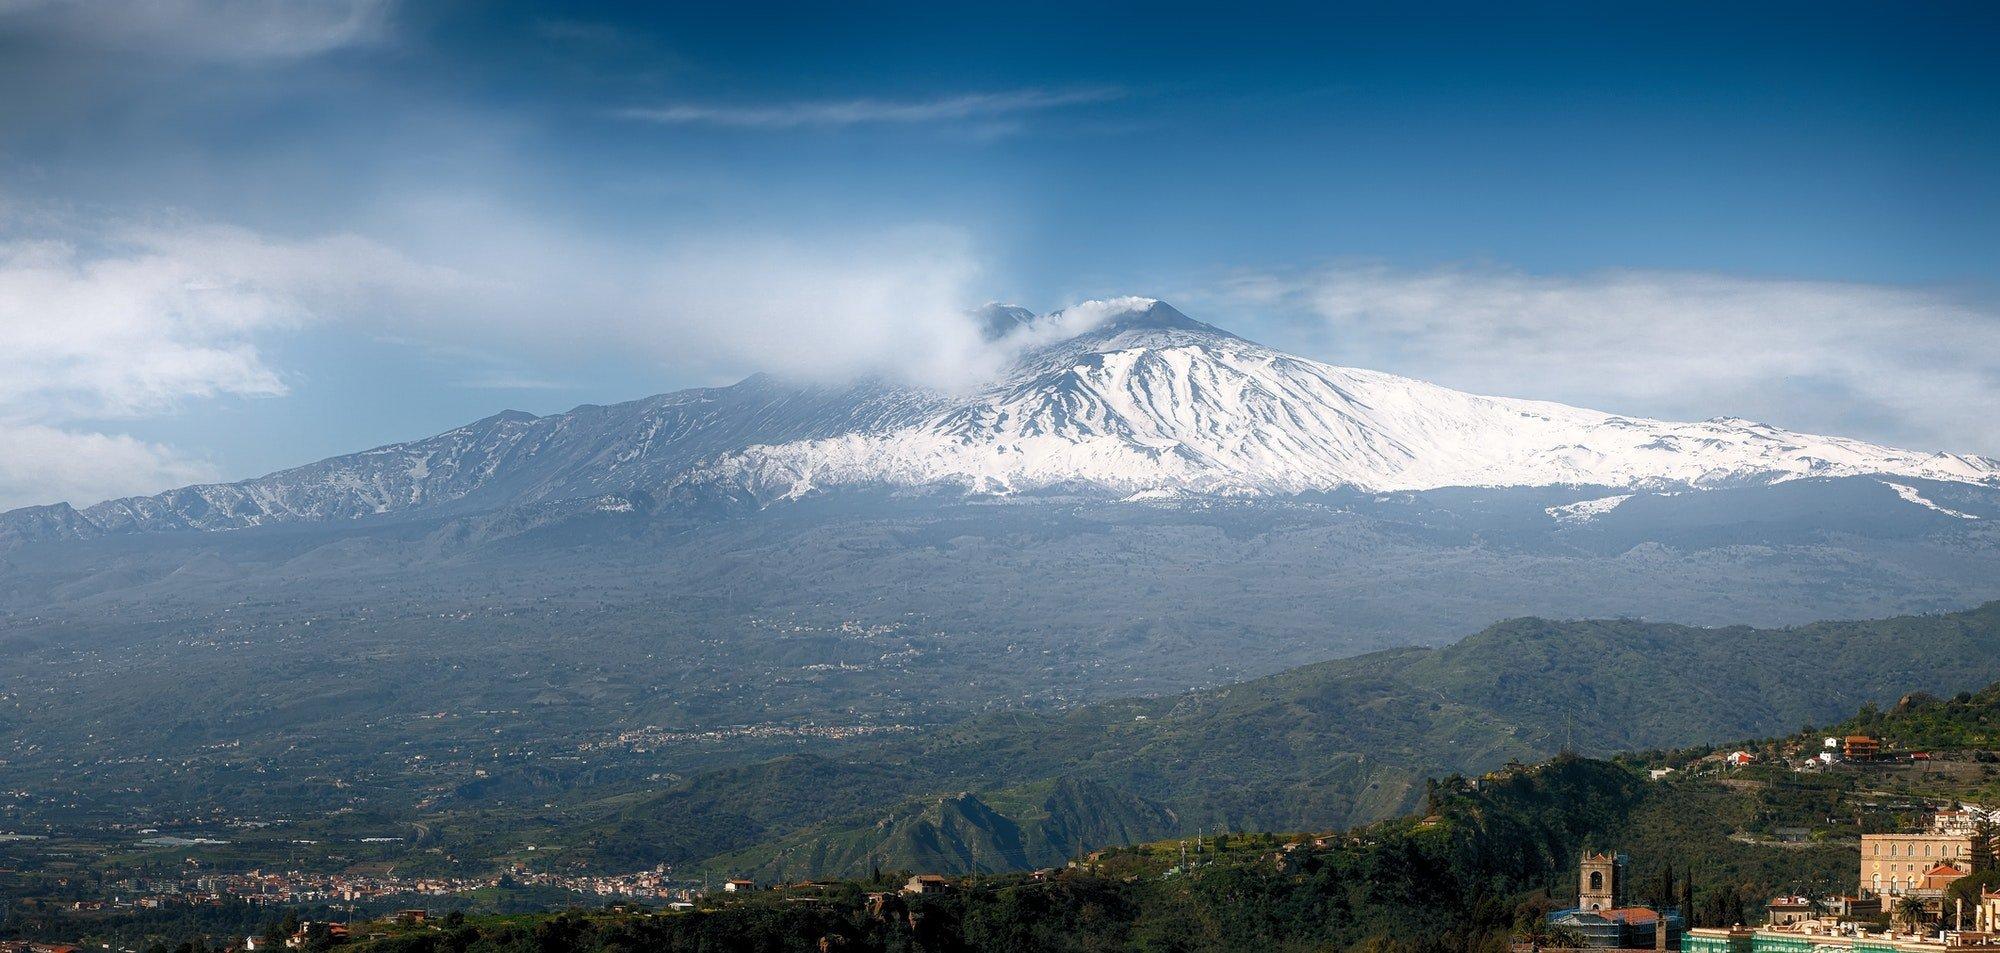 Smoking Mount Etna Volcano as seen from Taormina